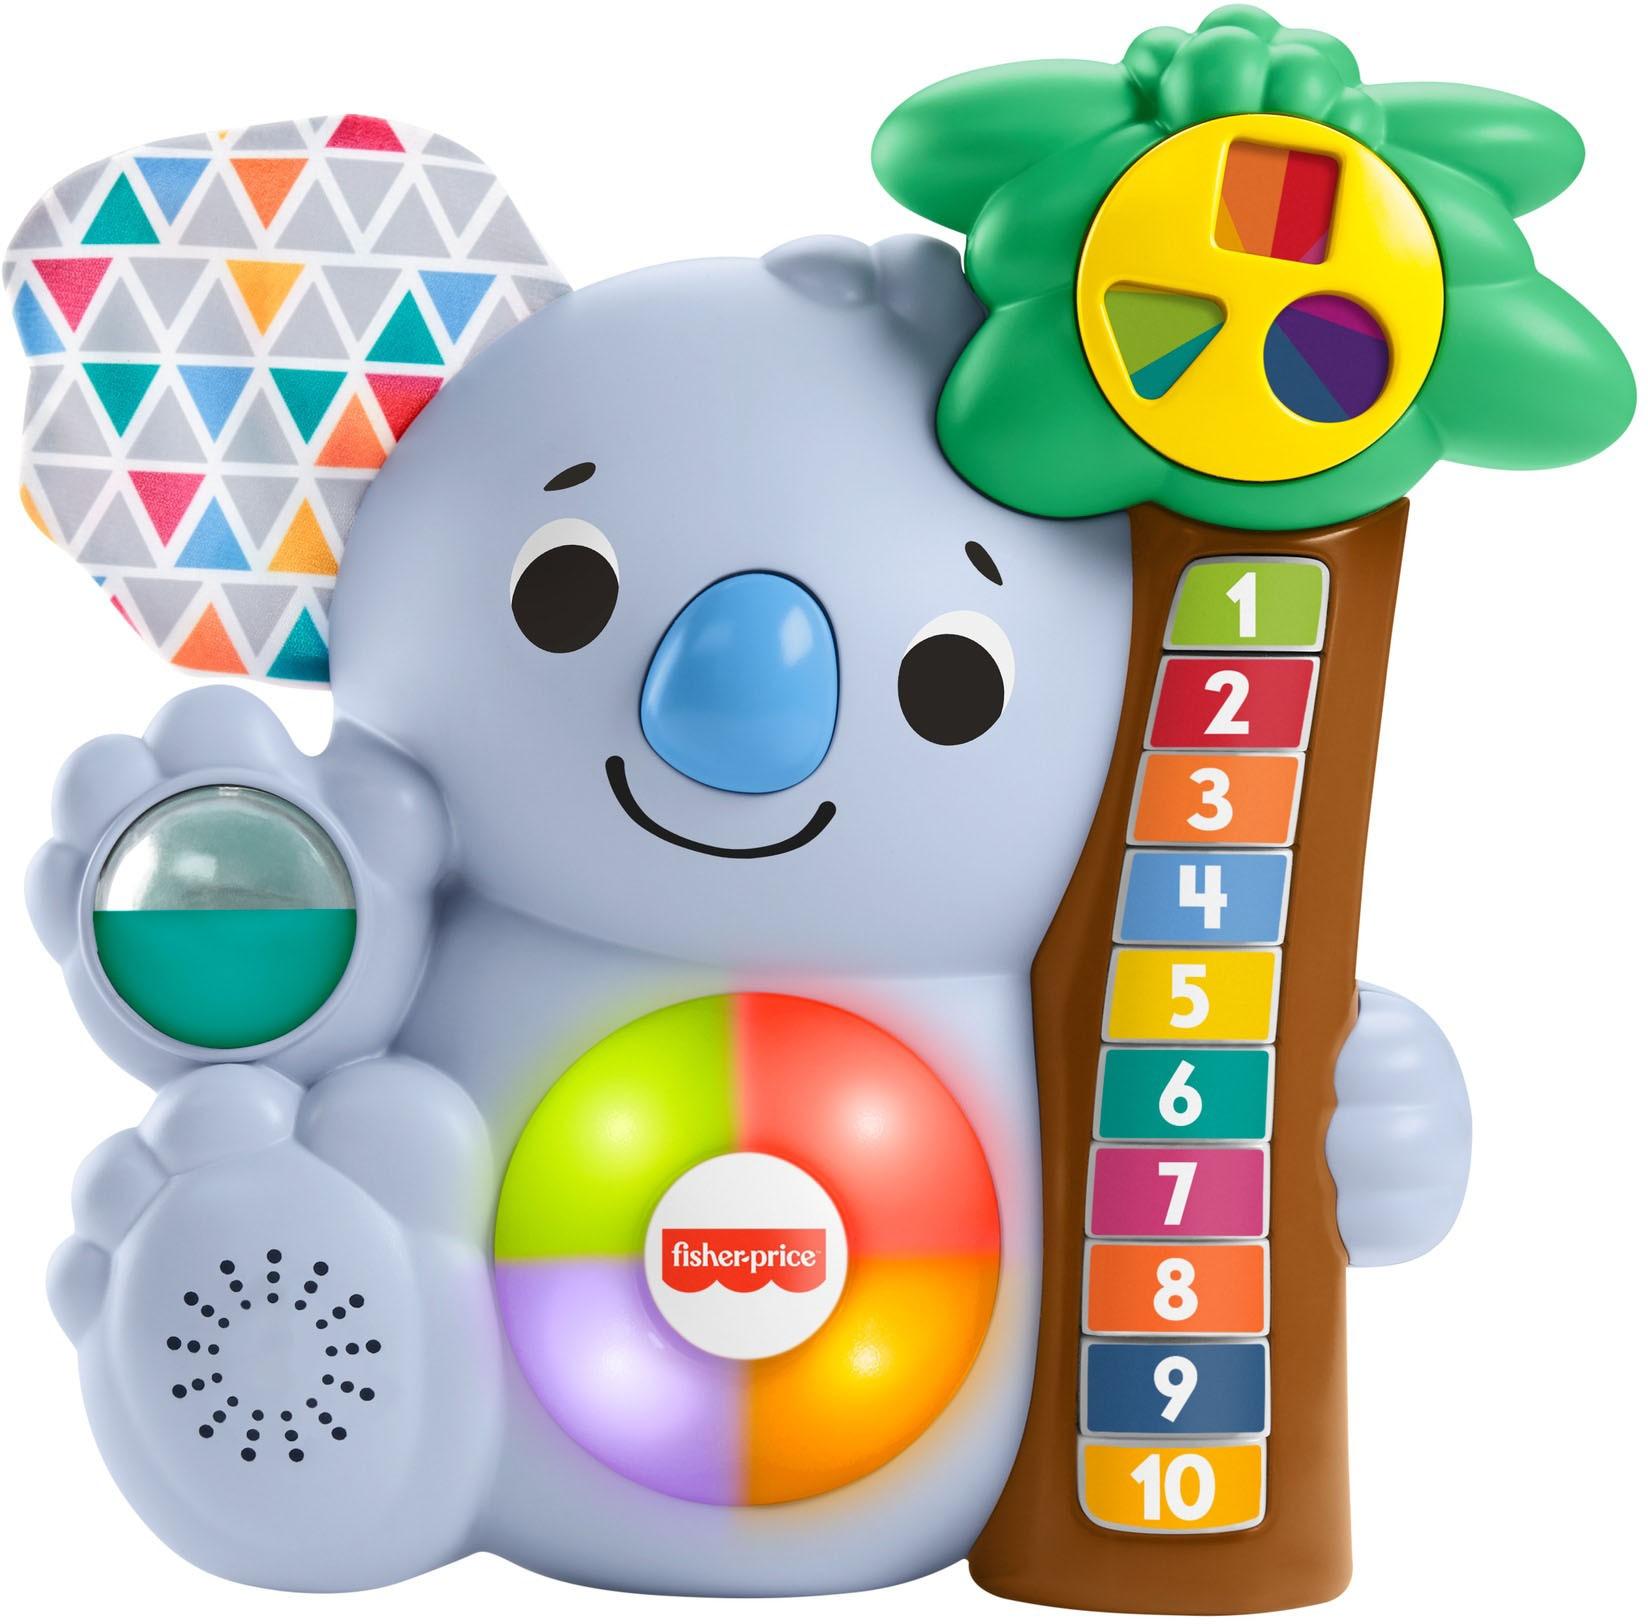 Fisher-Price Lernspielzeug, BlinkiLinkis Koala blau Kinder Lernspiele Lernspielzeug